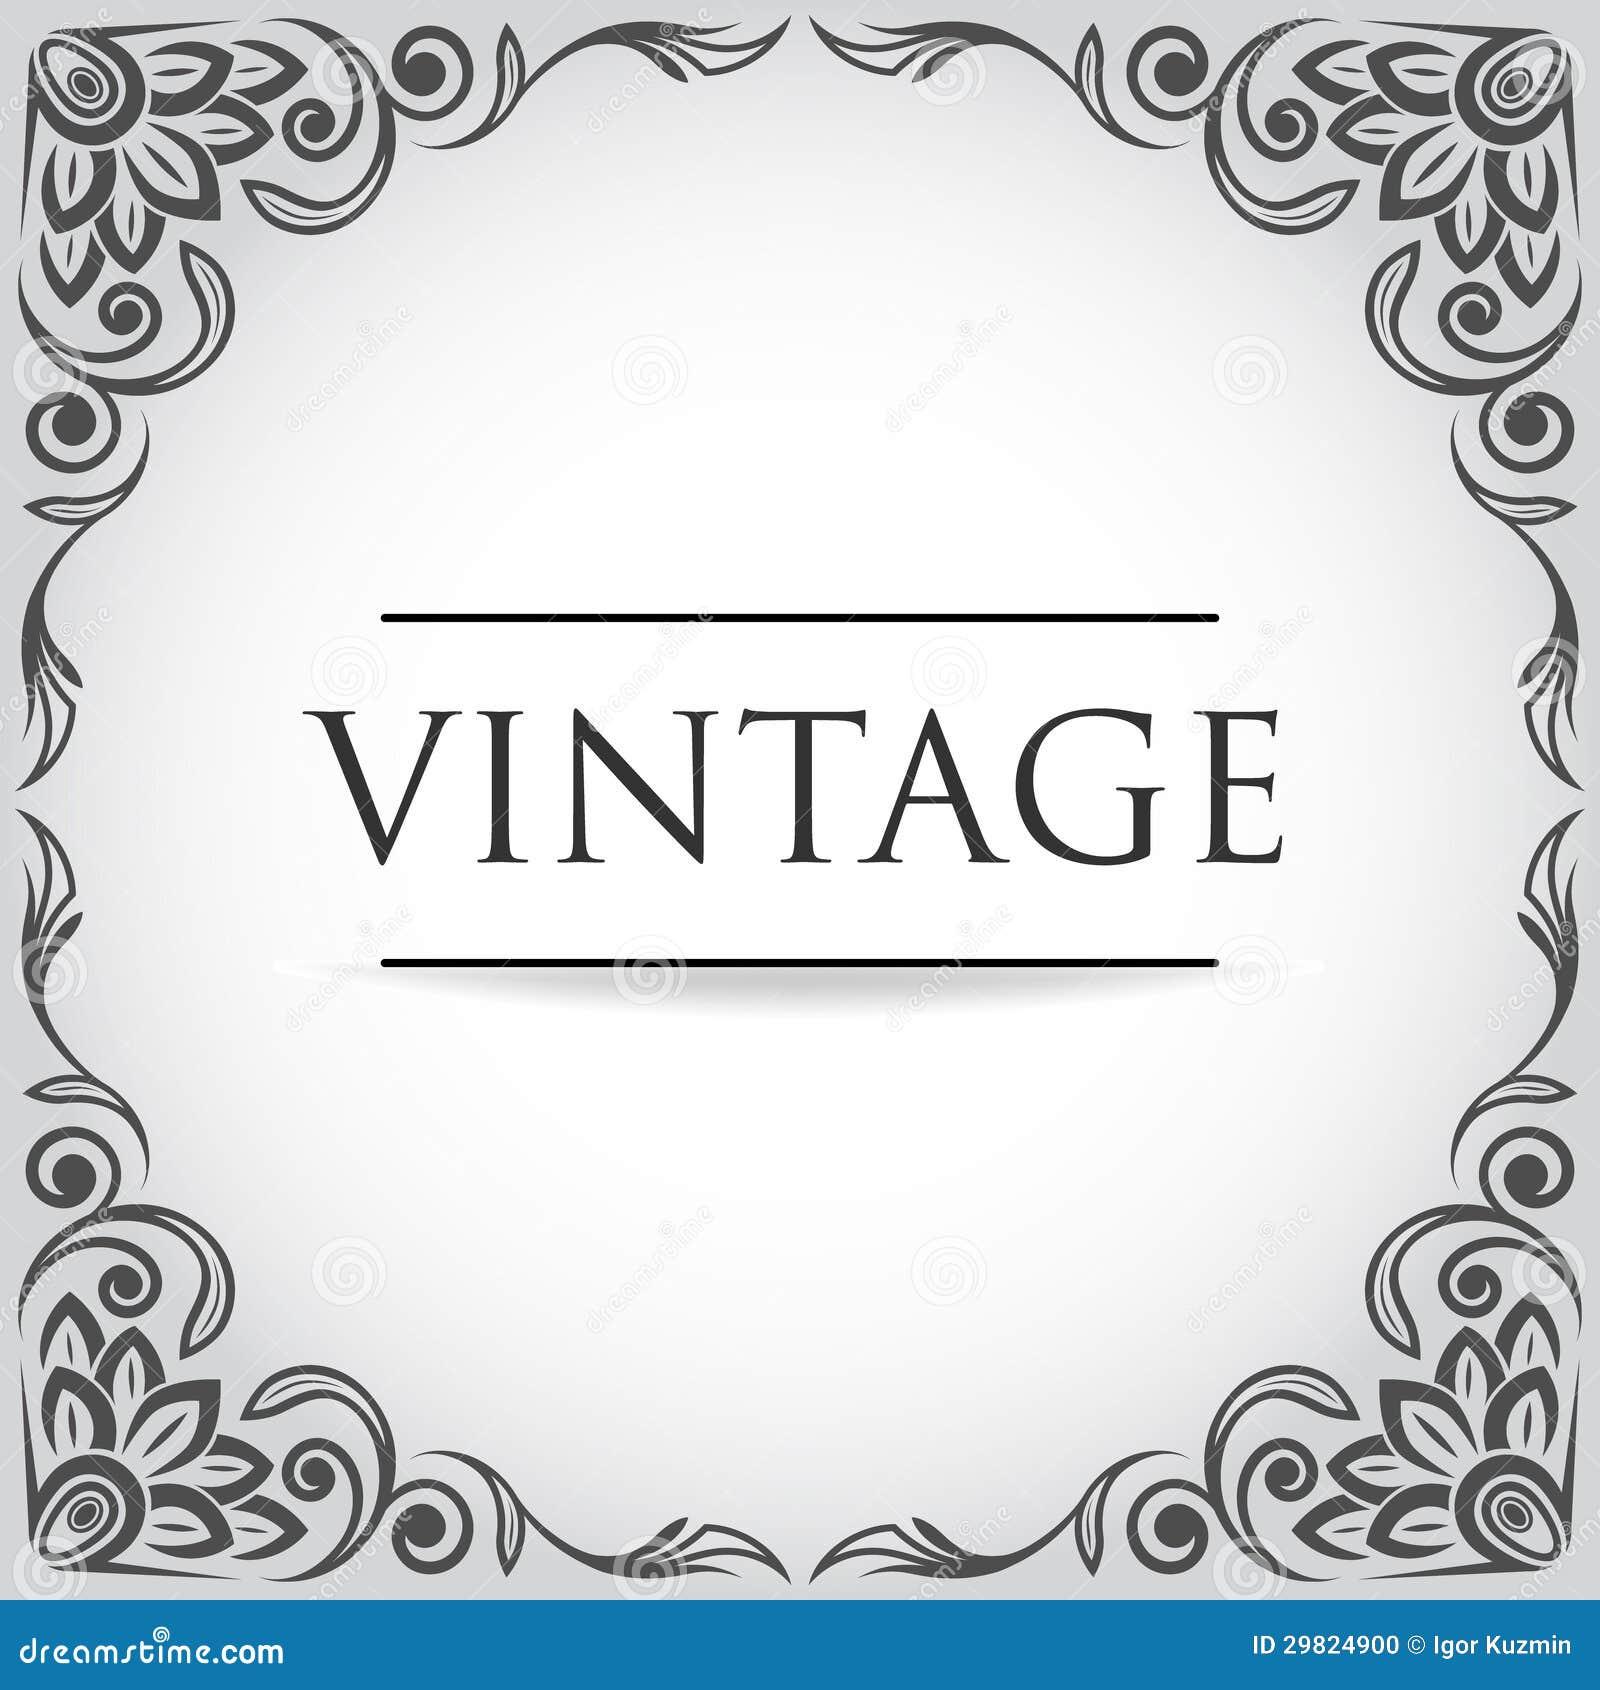 Vector Vintage Frame Stock Photo - Image: 29824900